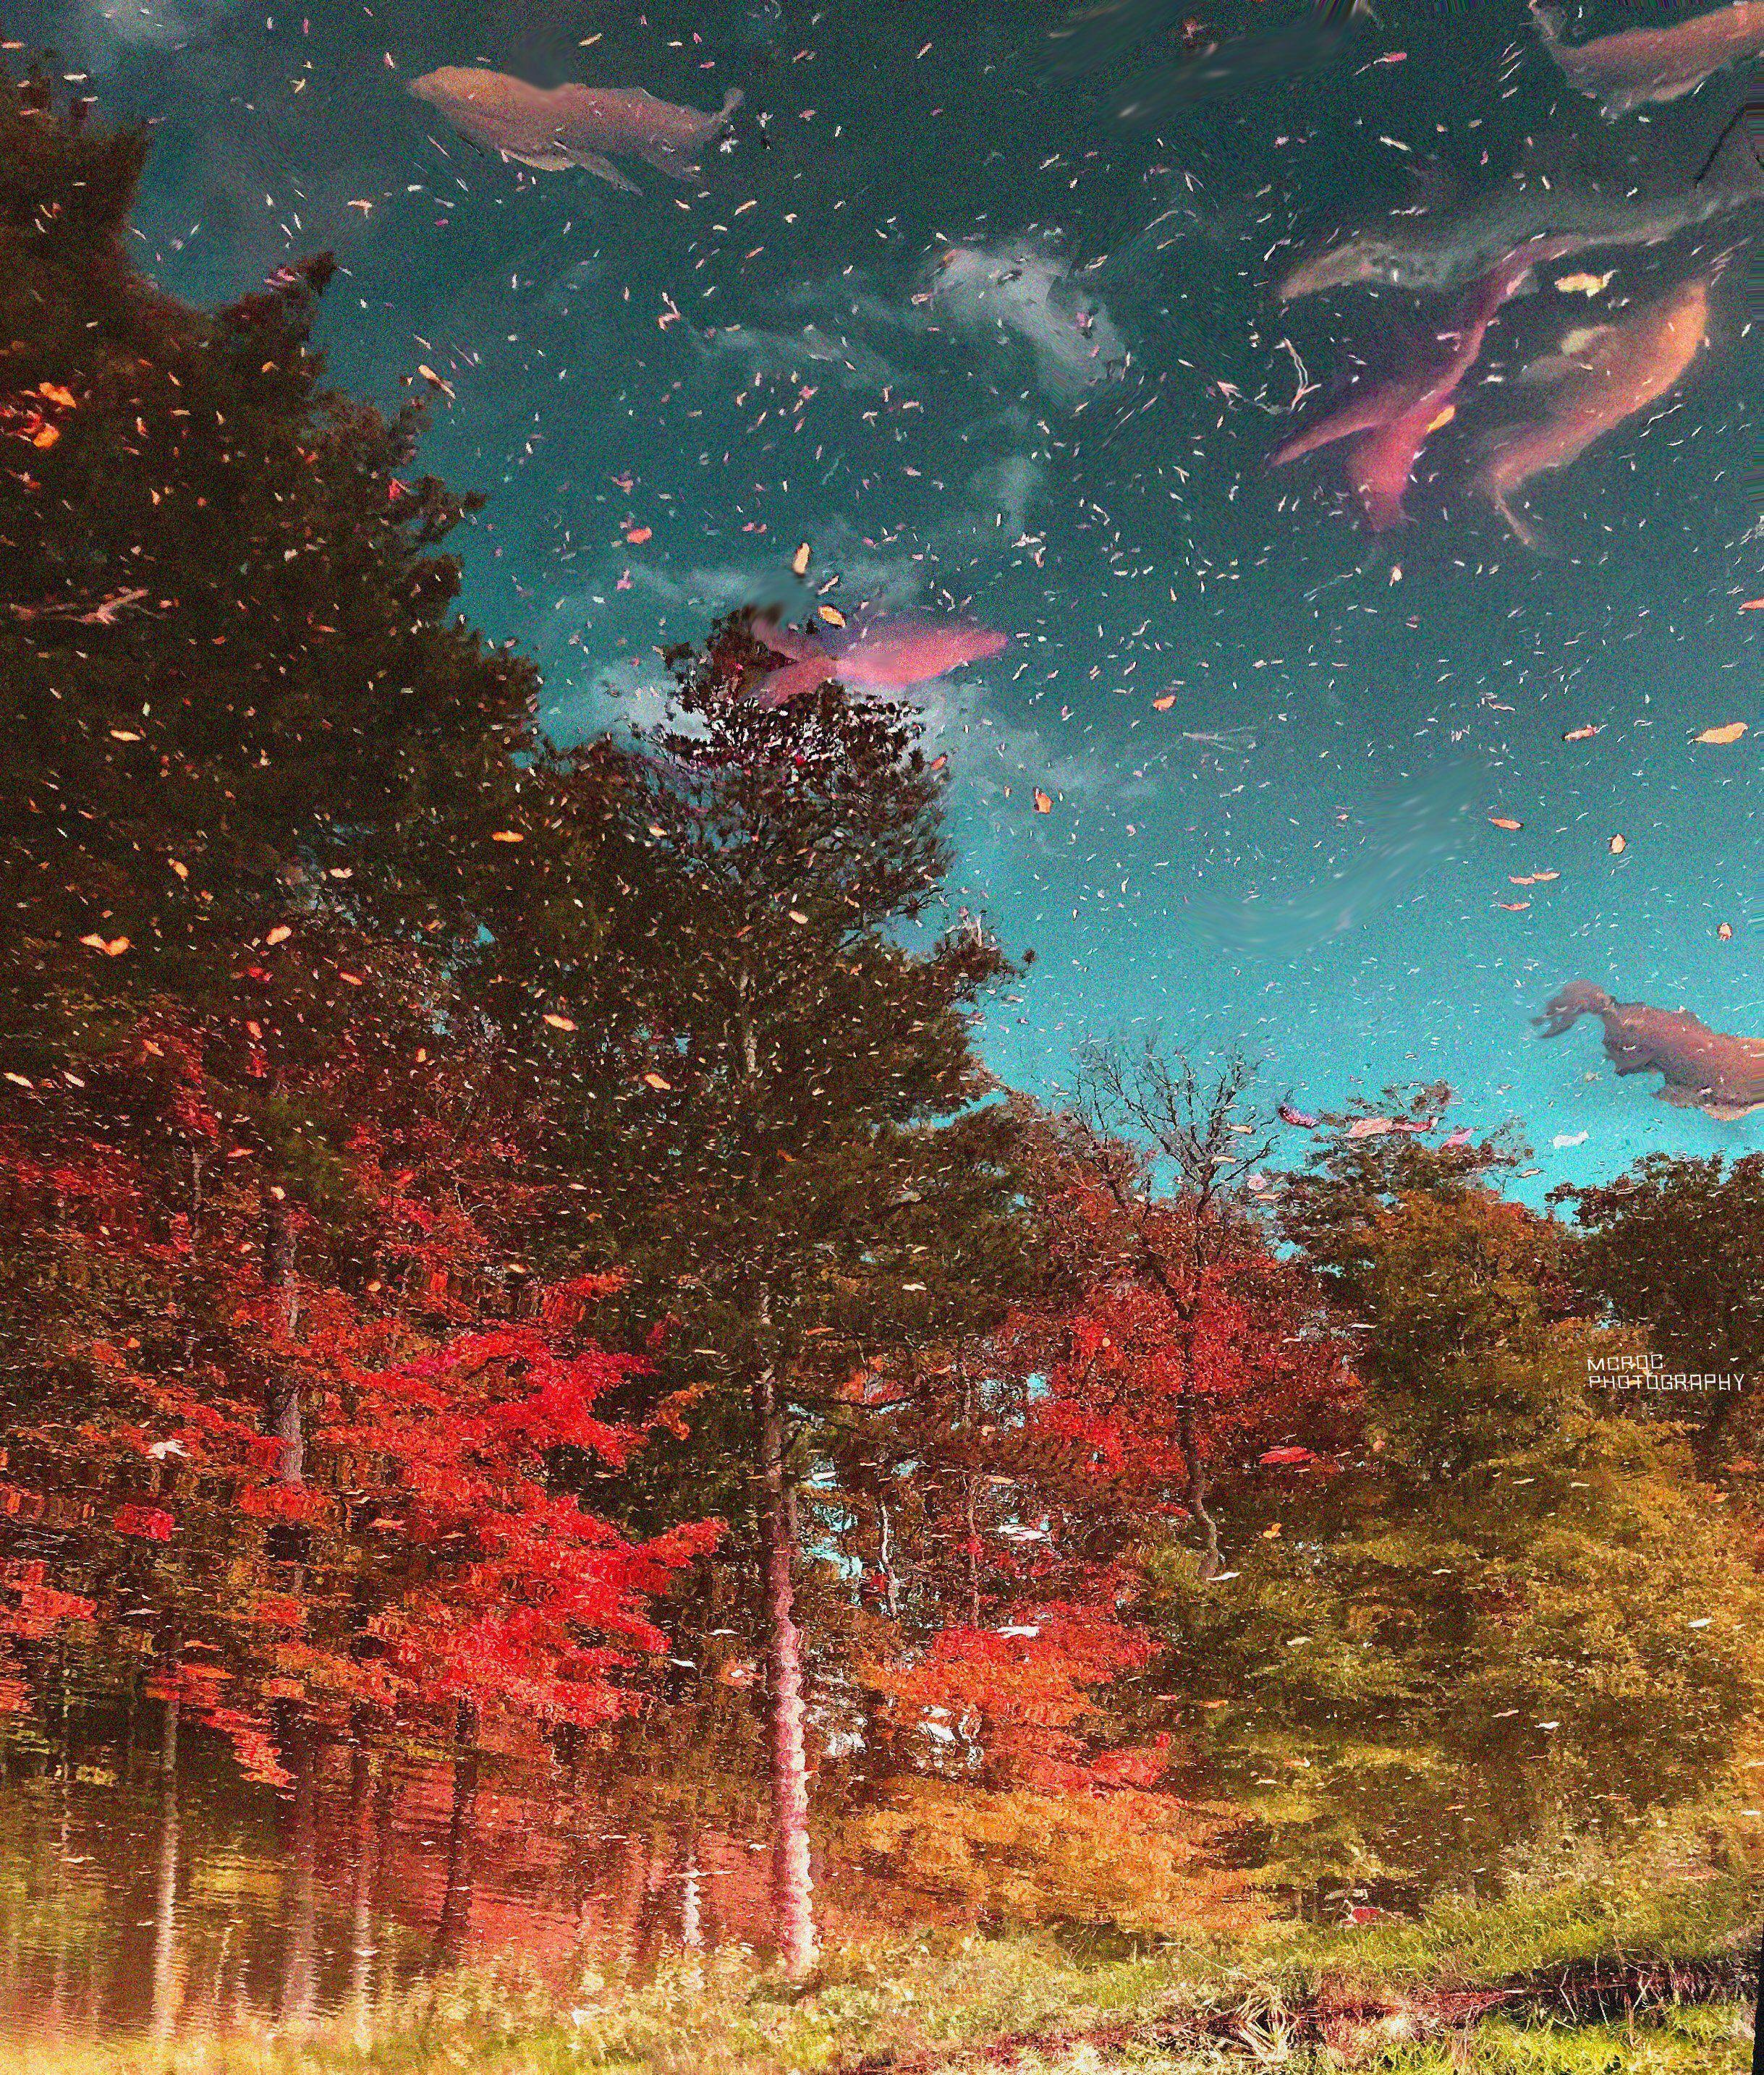 Top 20 Colorful Inspiring Landscapes Photography Lake Landscape Spring Wallpaper Nature Wallpaper